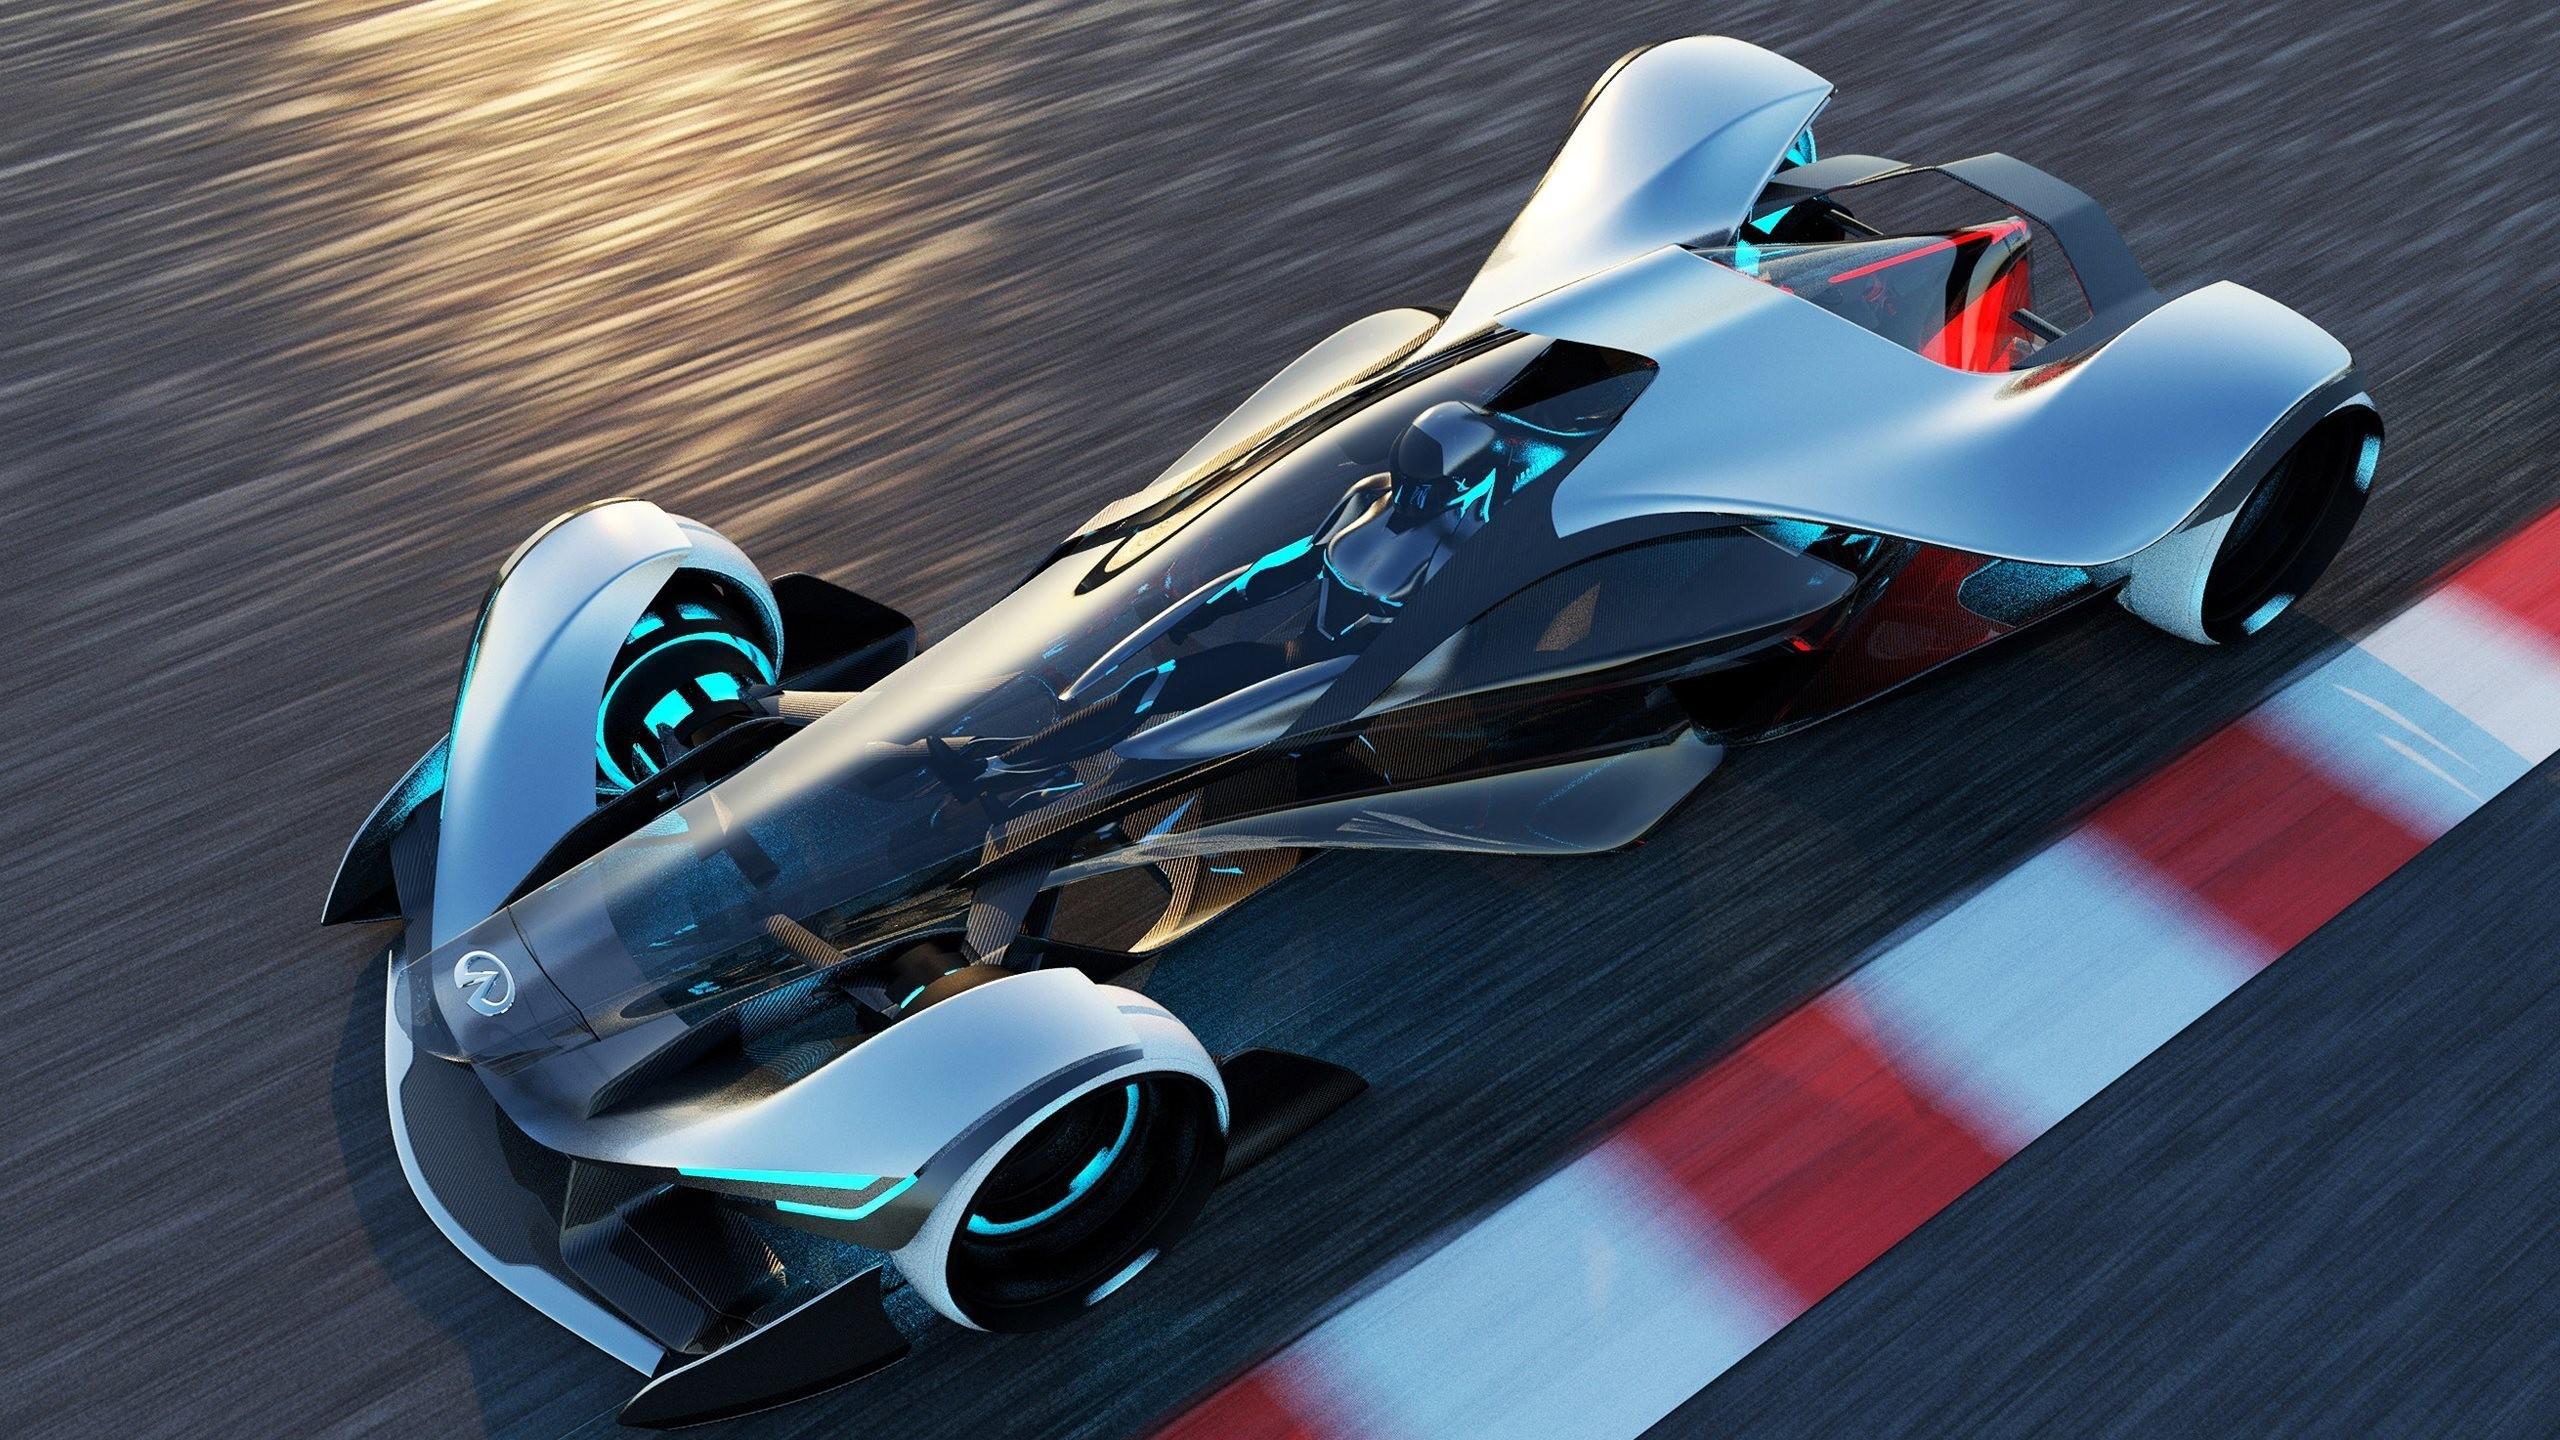 Wallpaper Digital Art Race Cars Futuristic Concept Sports Car Motion Blur Performance Infiniti Synaptiq Supercar Motorsport